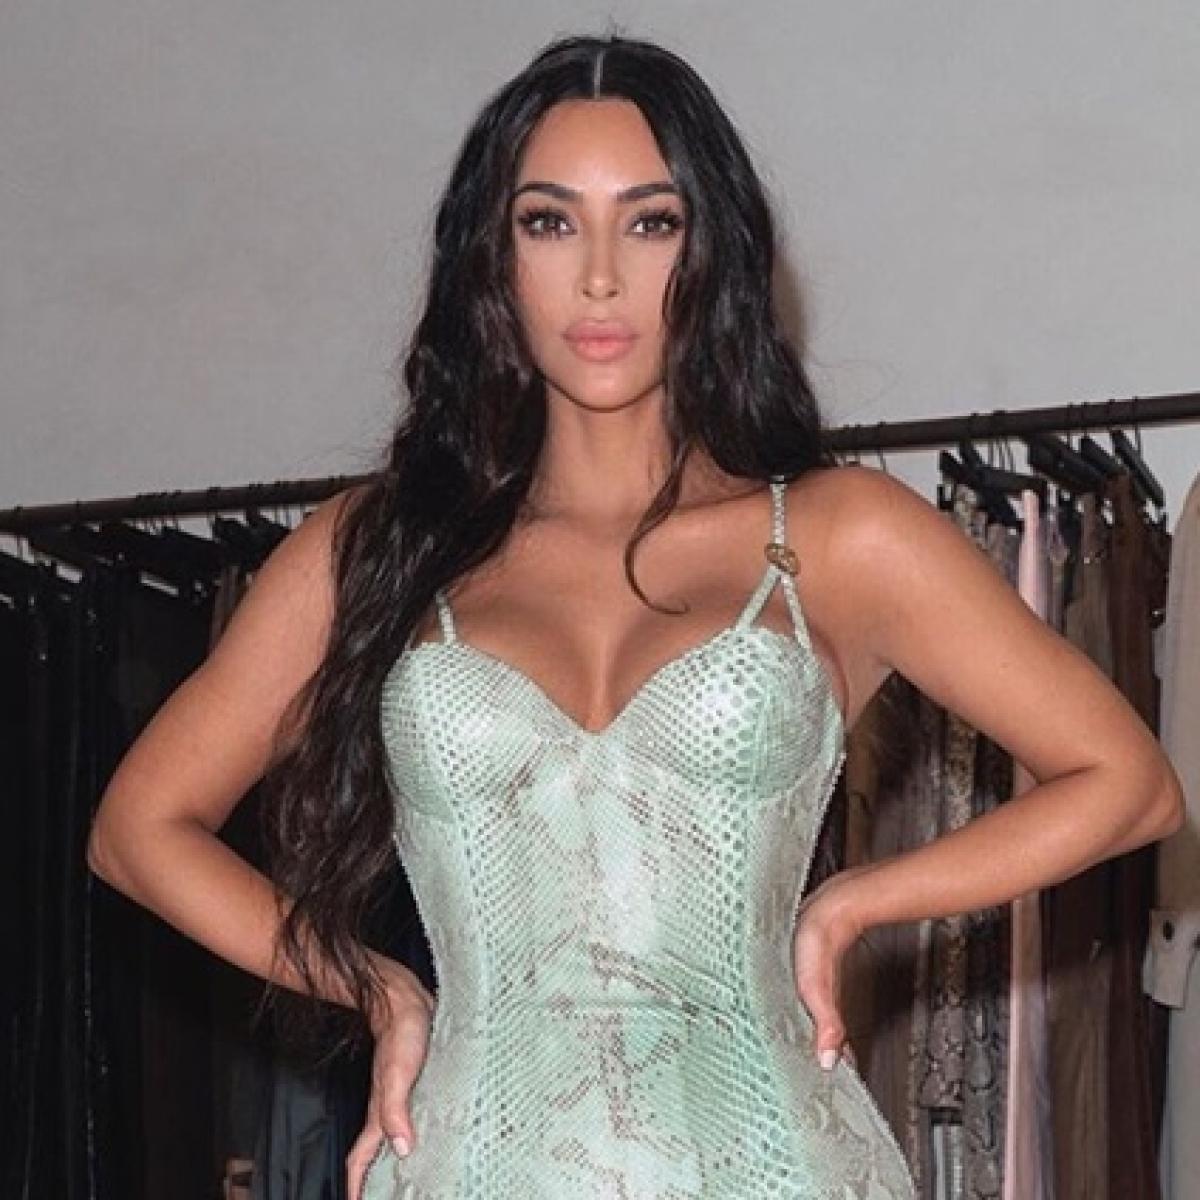 Kim Kardashian tosses away all plastic bottles after sis Kourtney gets bashed for using one